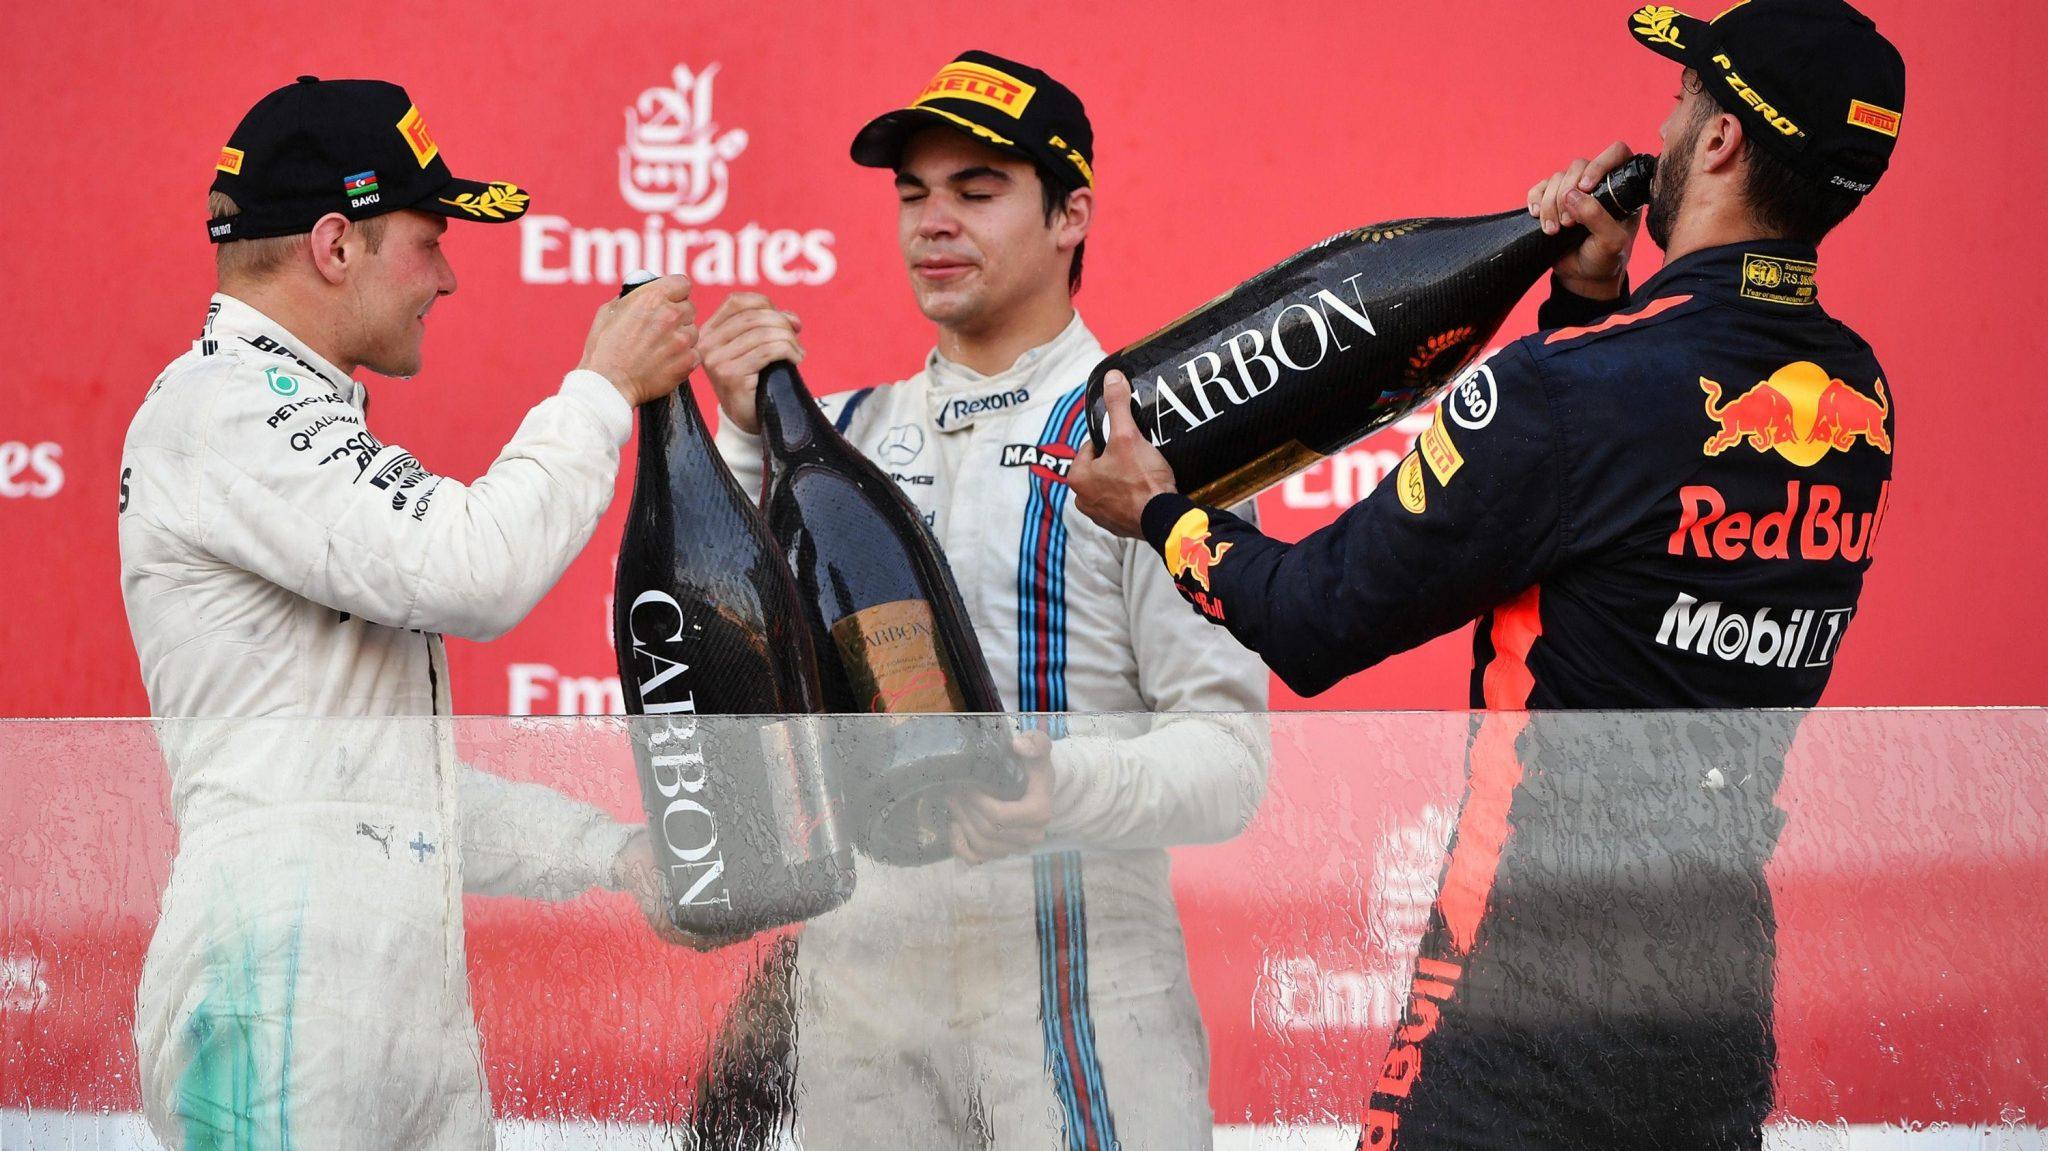 The Baku GP podium (From L to R): Bottas, Stroll, and Ricciardo